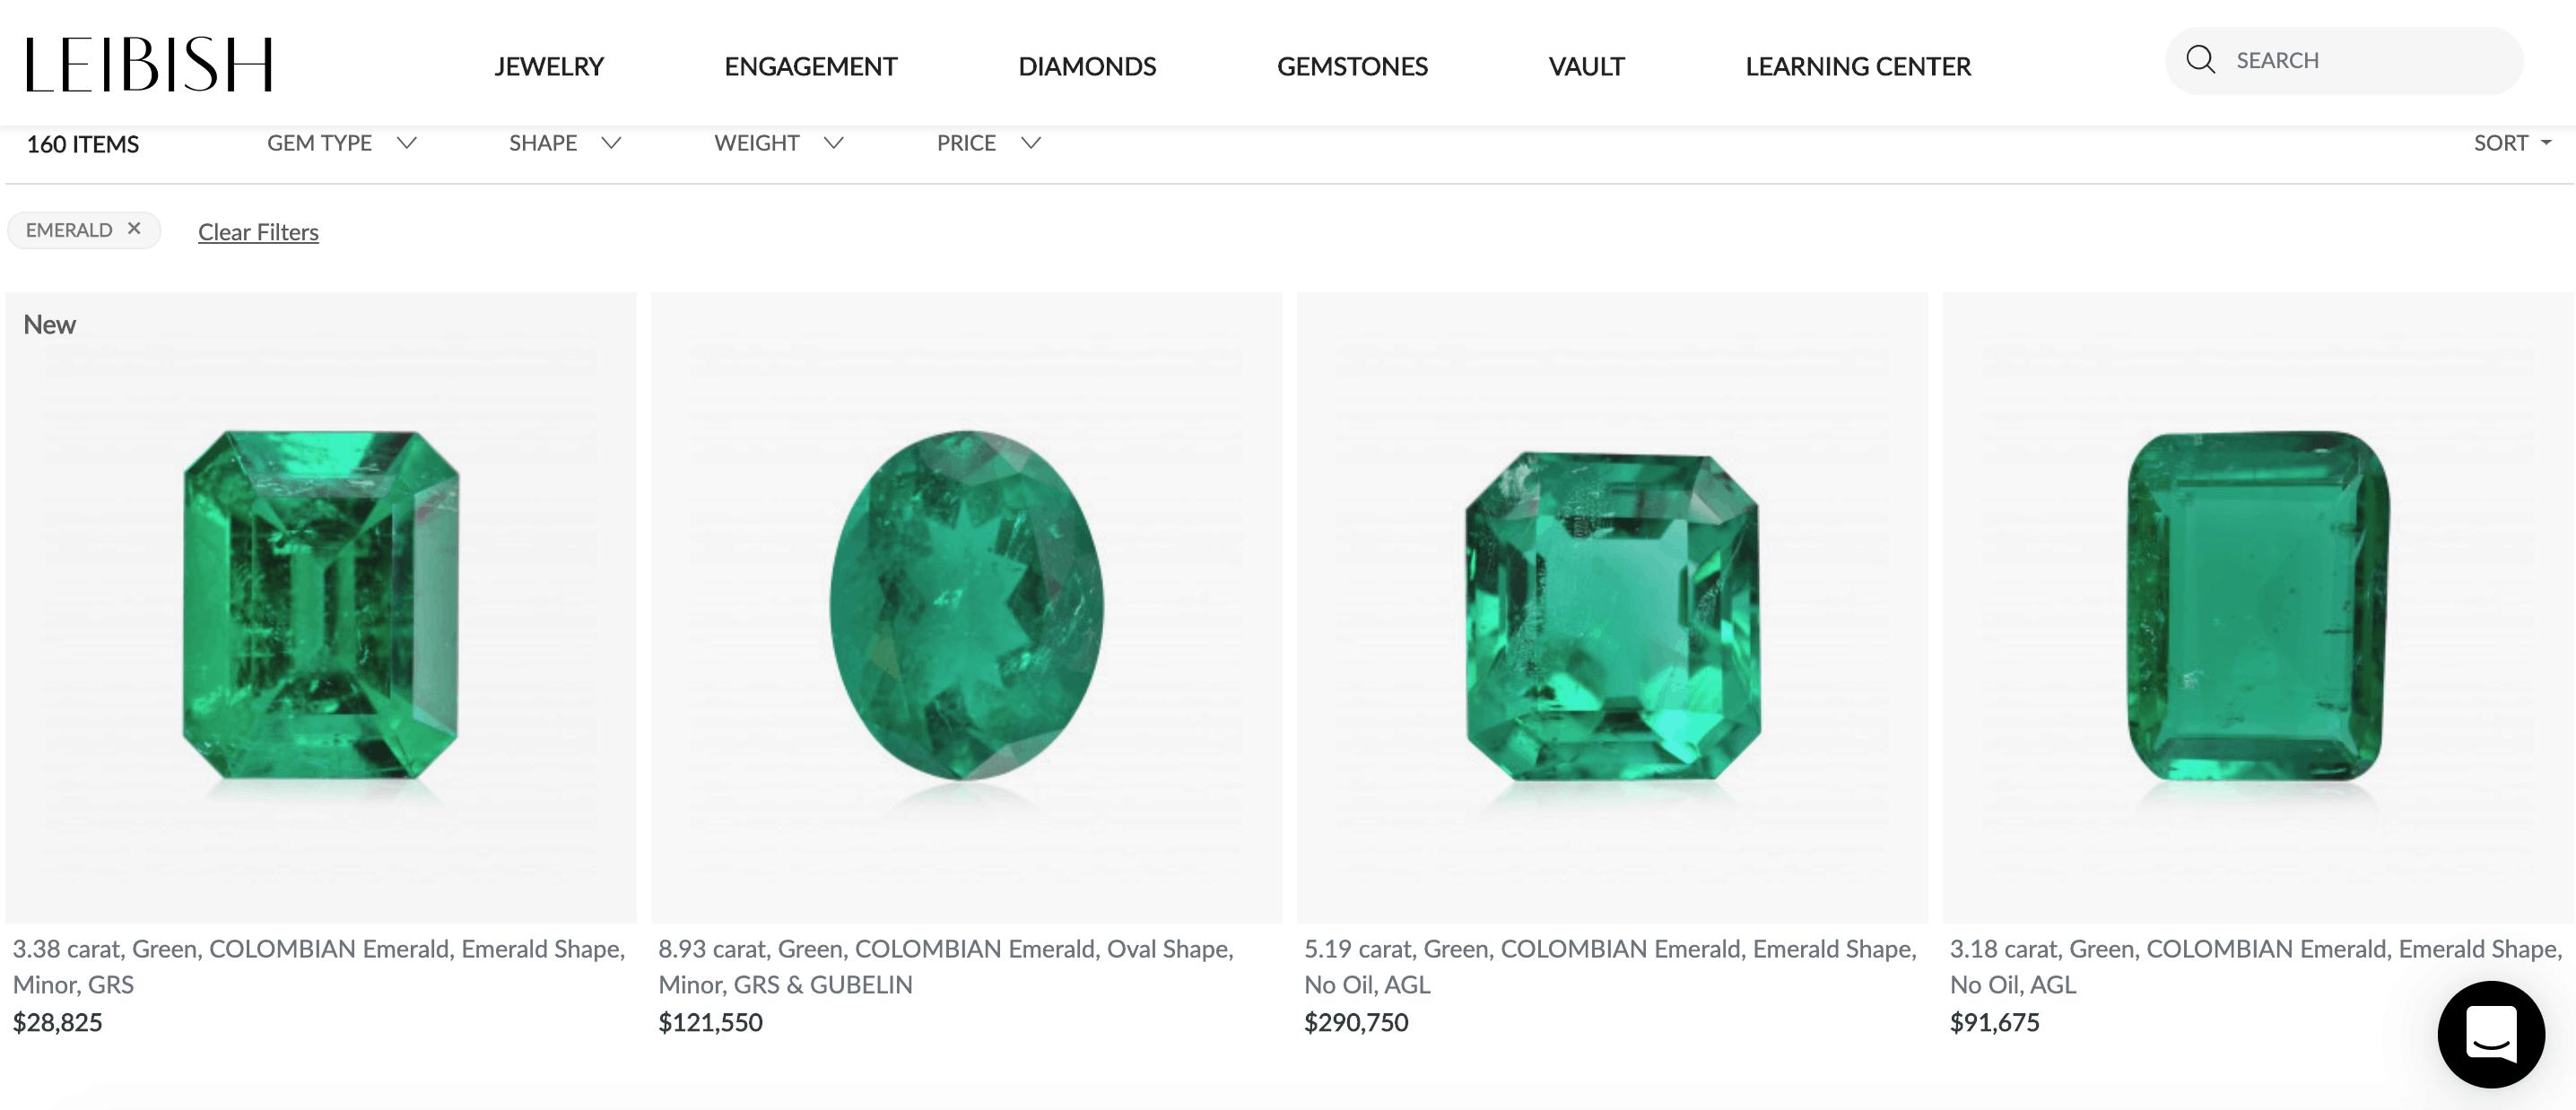 leibish & co emerald jewelry